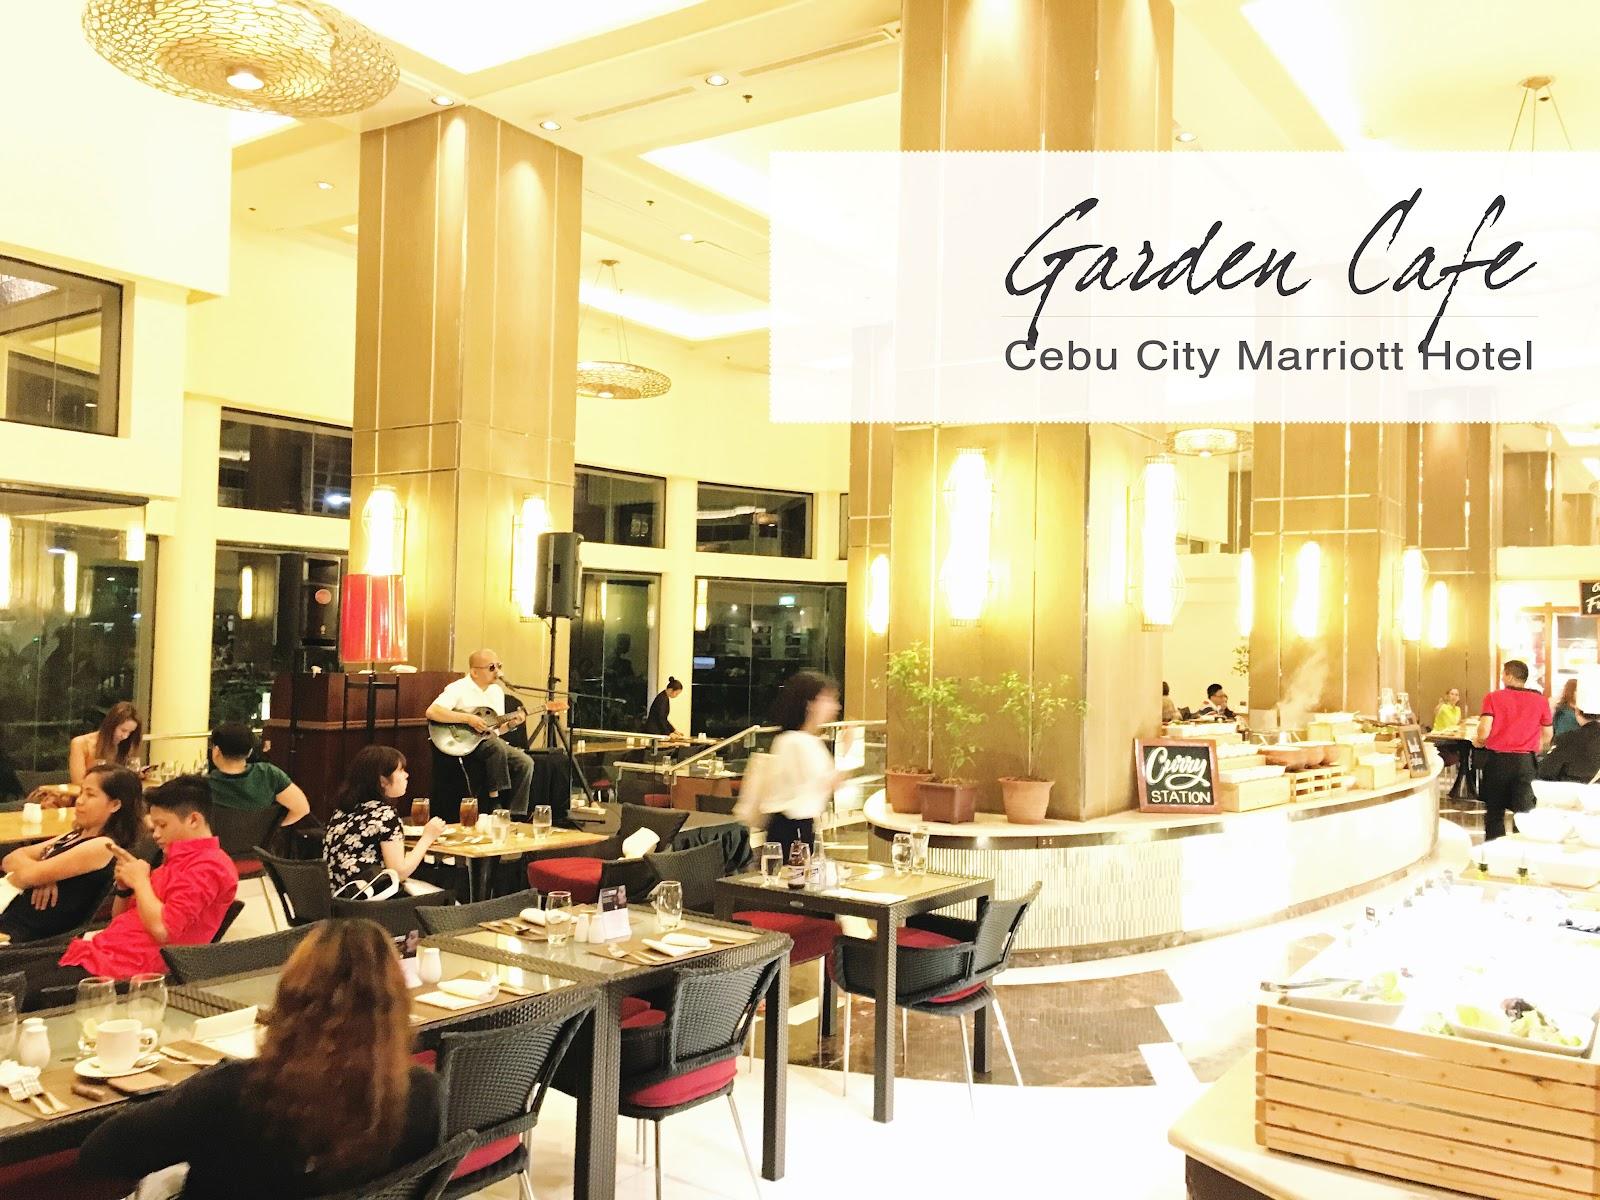 Cebu Fashion Bloggers, Cebu Bloggers, fashion bloggers, food bloggers, beauty blogger, beauty bloggers, cebu beauty blogger, cebu beauty bloggers, lifestyle bloggers, asian blogger, cebu, philippines, social influencer, online influencer, philippine bloggers, philippine fashion bloggers, toni pino-oca, Cebu Fashion Bloggers network, cebu fashion blogger, cebu bloggers society, cebu blogger, online shopping, fujifilm philippines, fujifilm xt-10, cebu style blogger, cebu style bloggers, cebu style blog, cebu city marriott hotel, garden cafe blogger discount, special blogger rate privilege